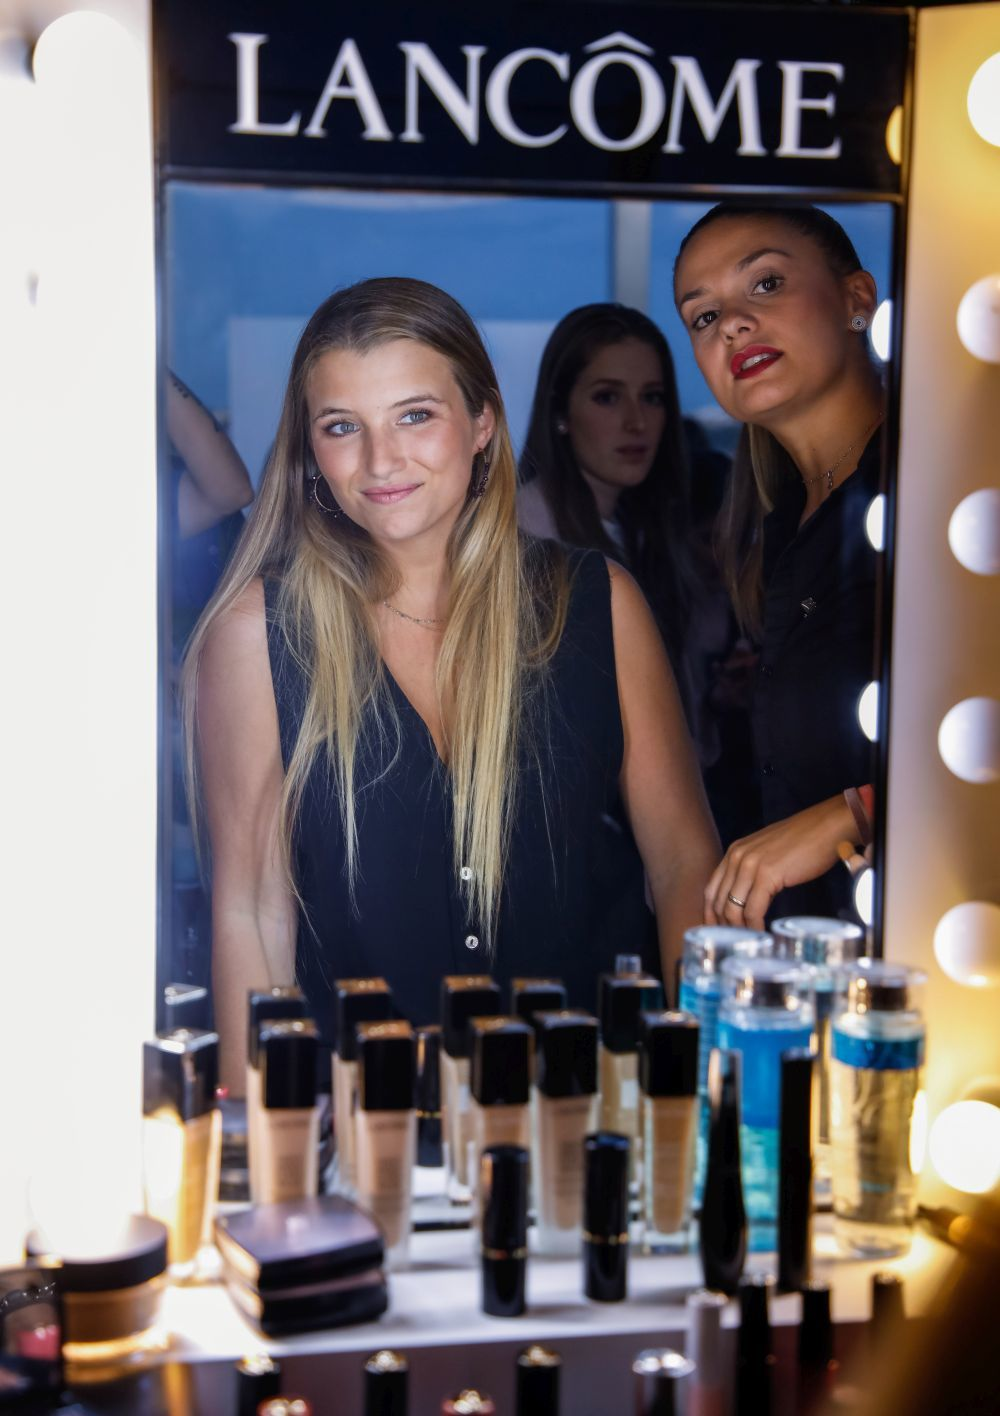 Tania Carrasco, makeup artist de Lancôme